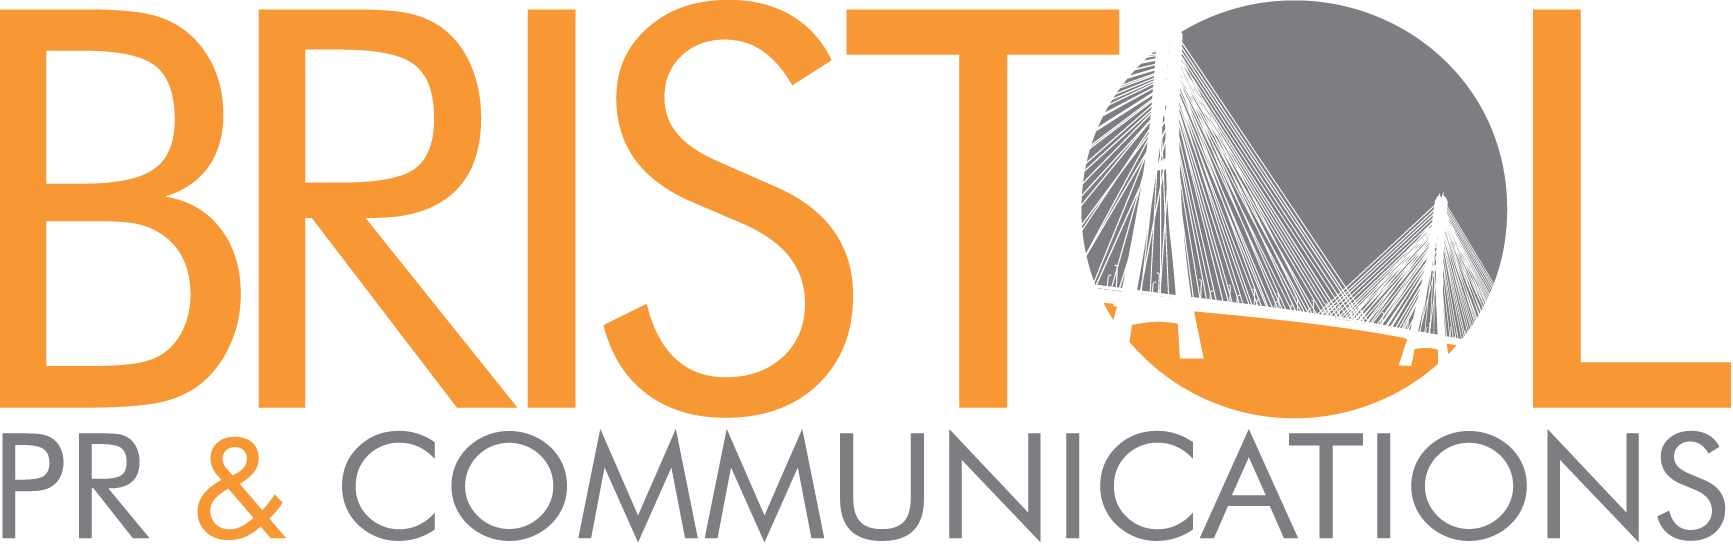 Bristol PR & Communication